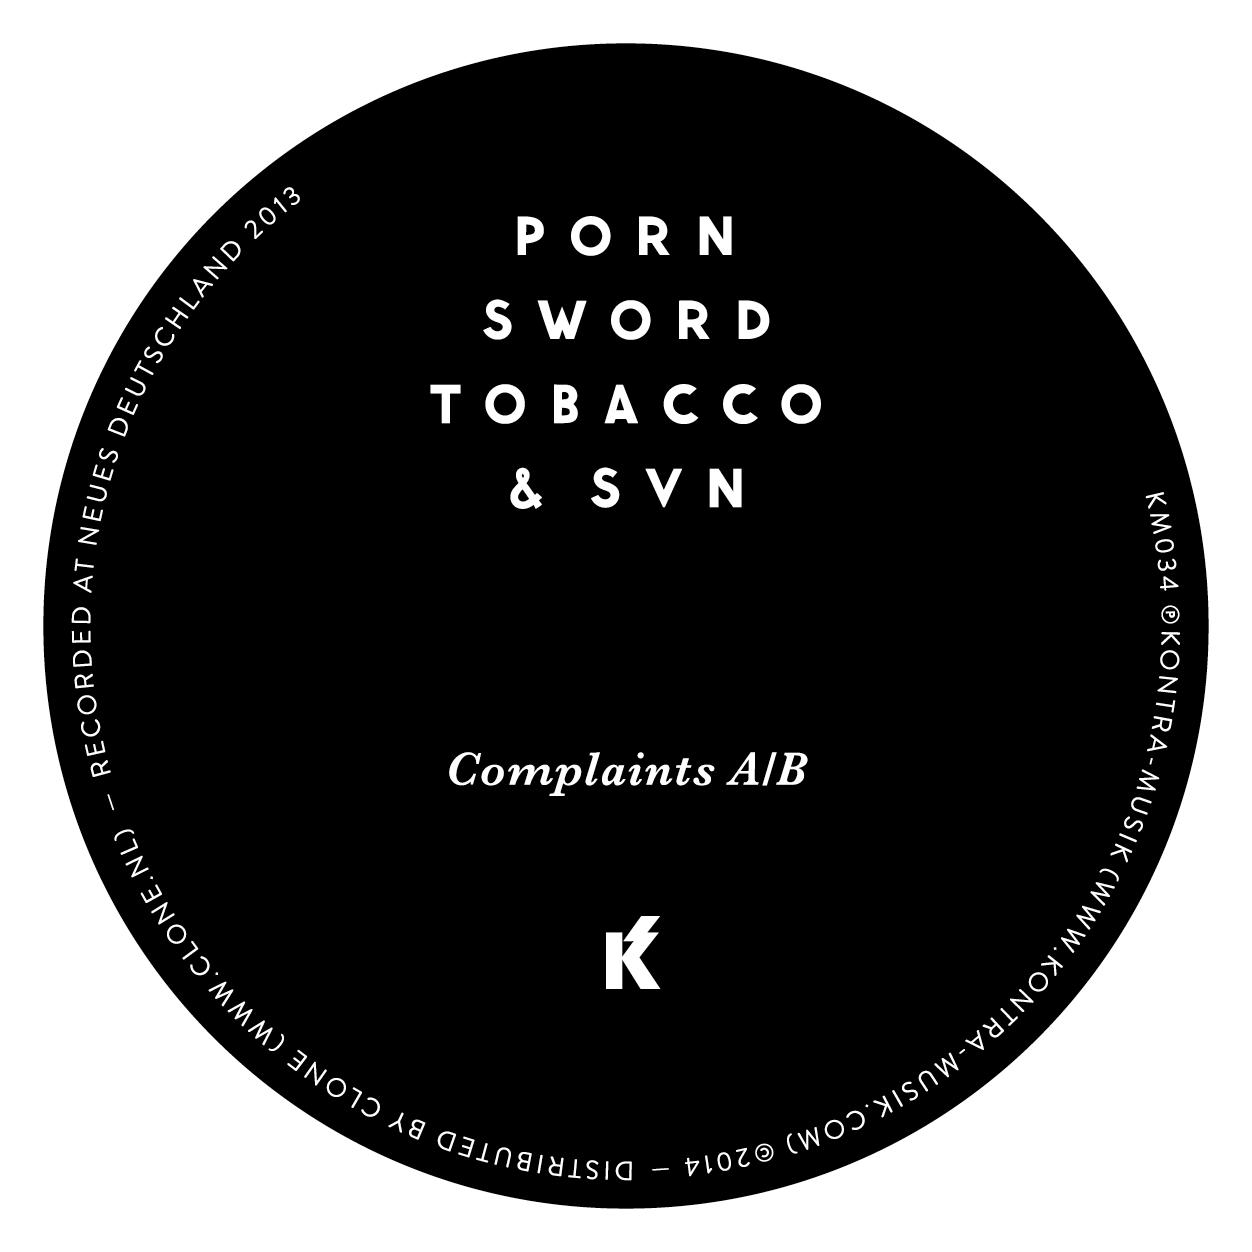 km034_porn-sword-tobacco-complaints_kontramusik_B.png